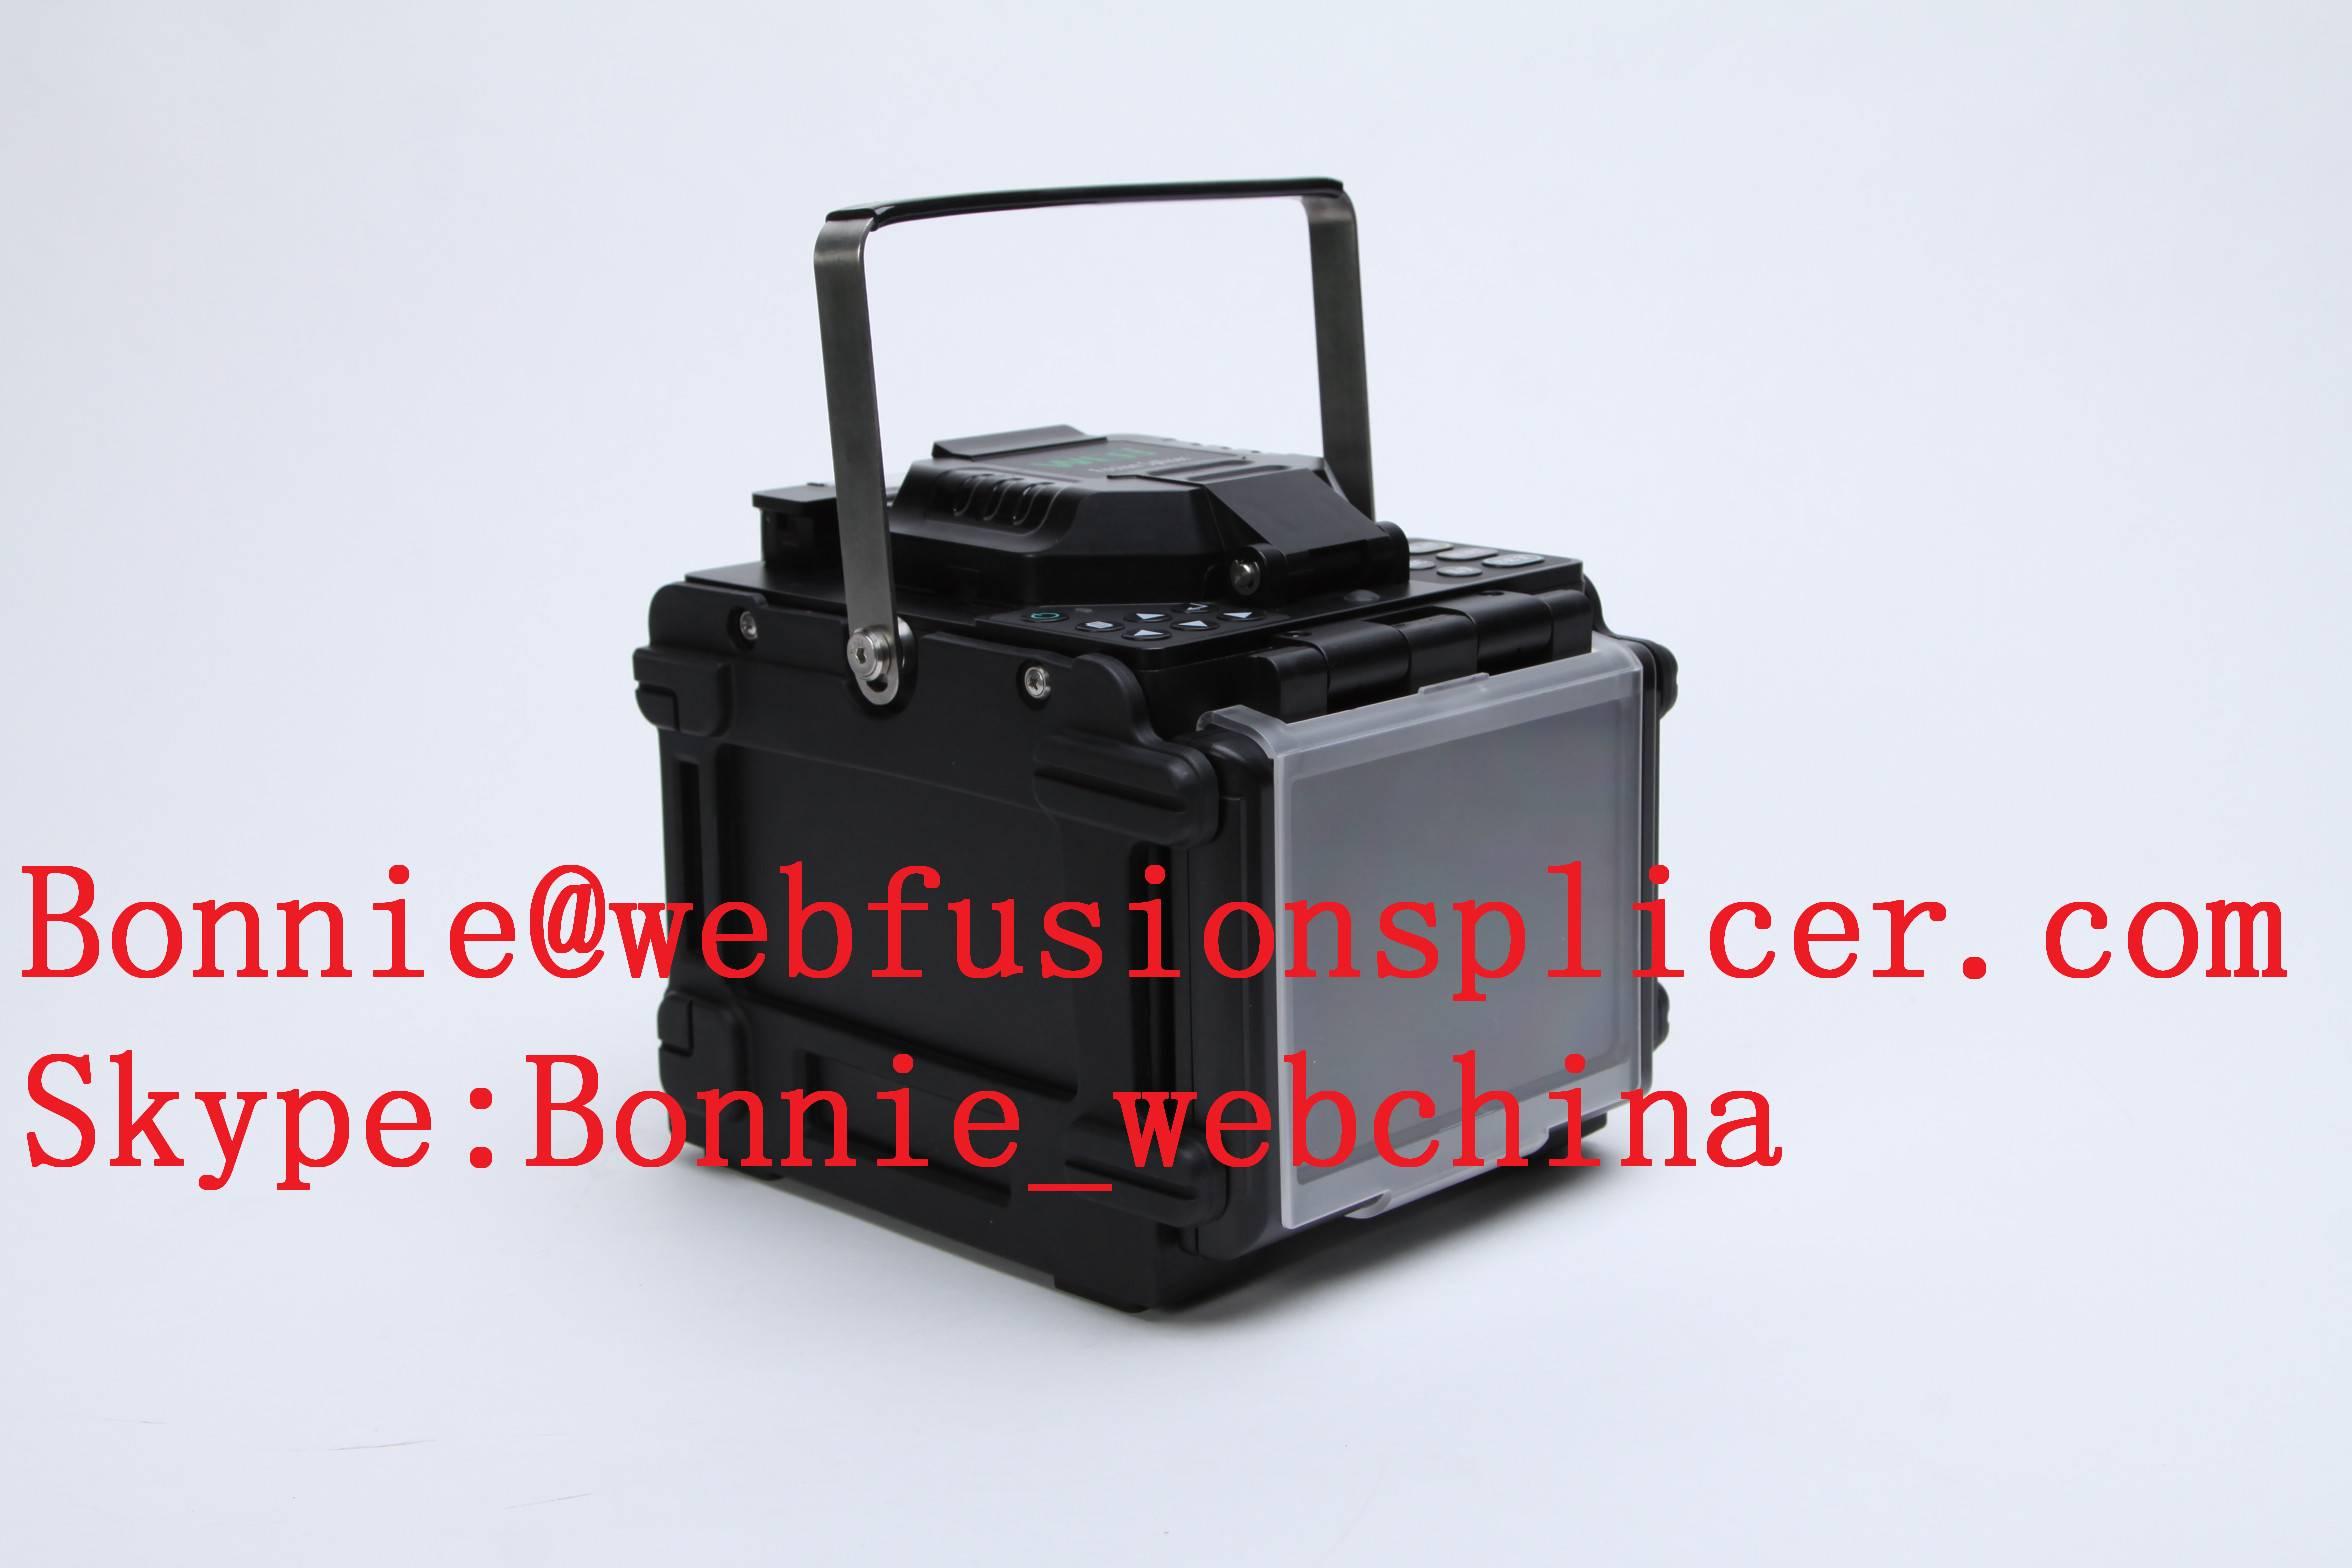 optical fiber fusion splicer, fiber optic fusion splicer, factory wholesale fiber optic equipment